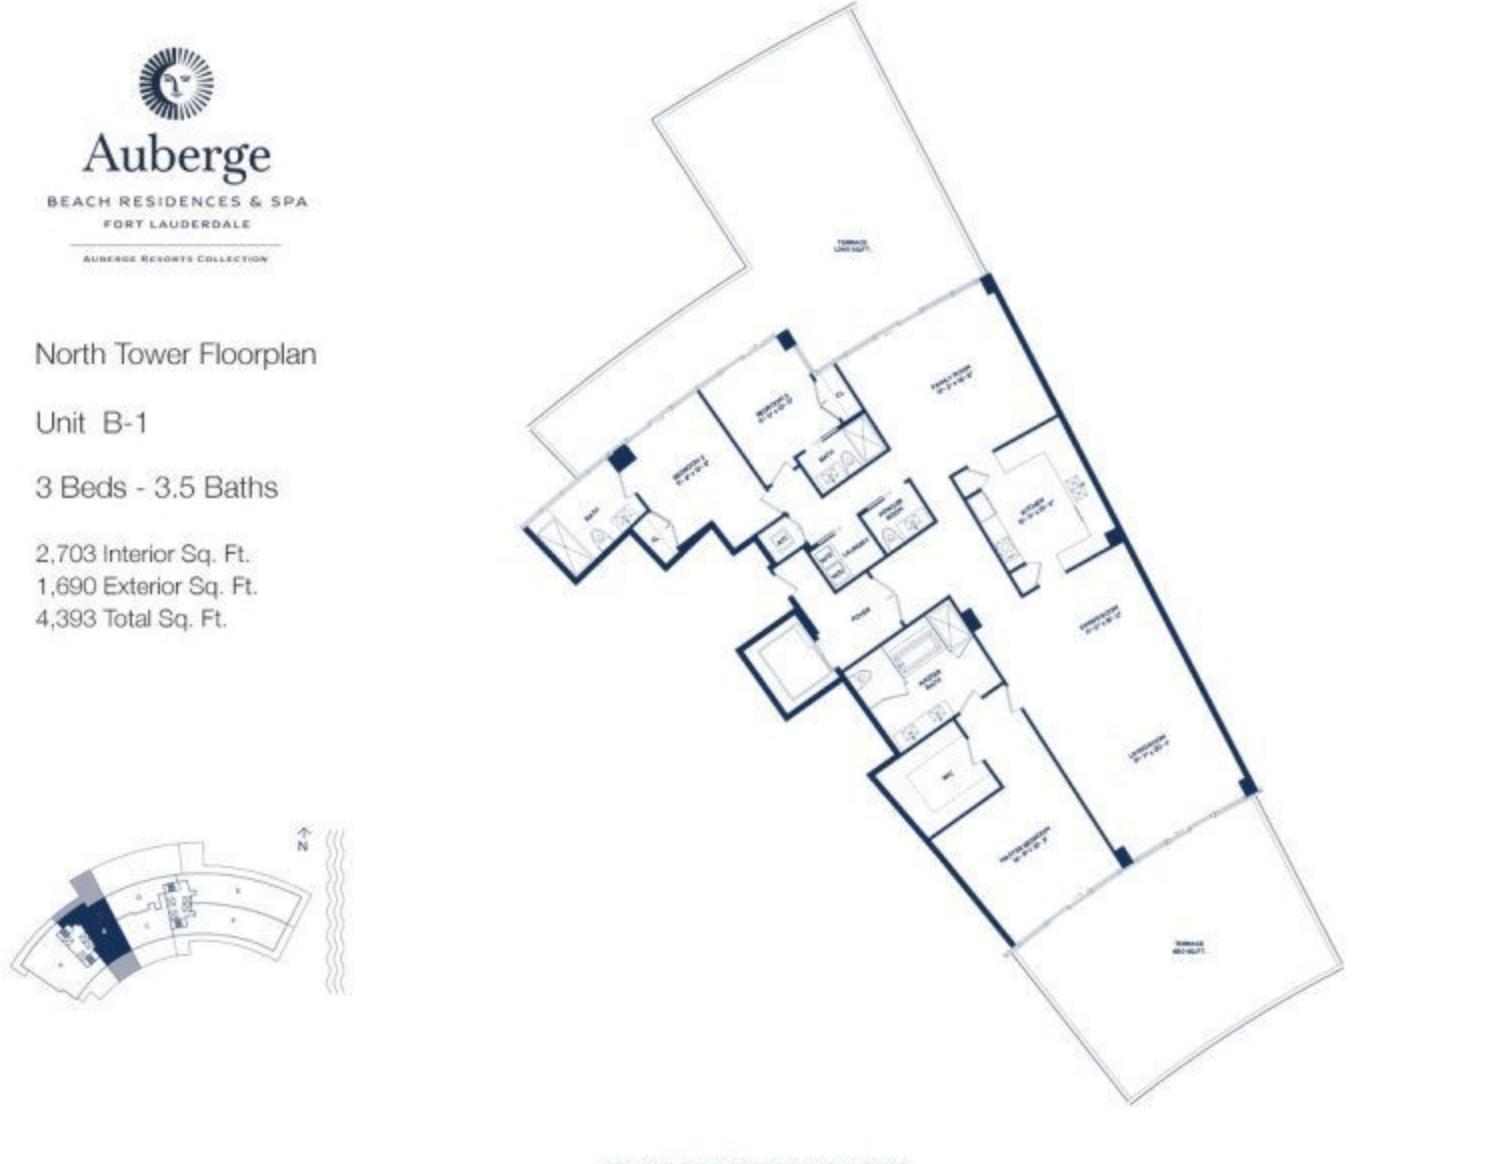 Auberge Beach Residences North Tower B1 | 3 Beds - 3.5 baths